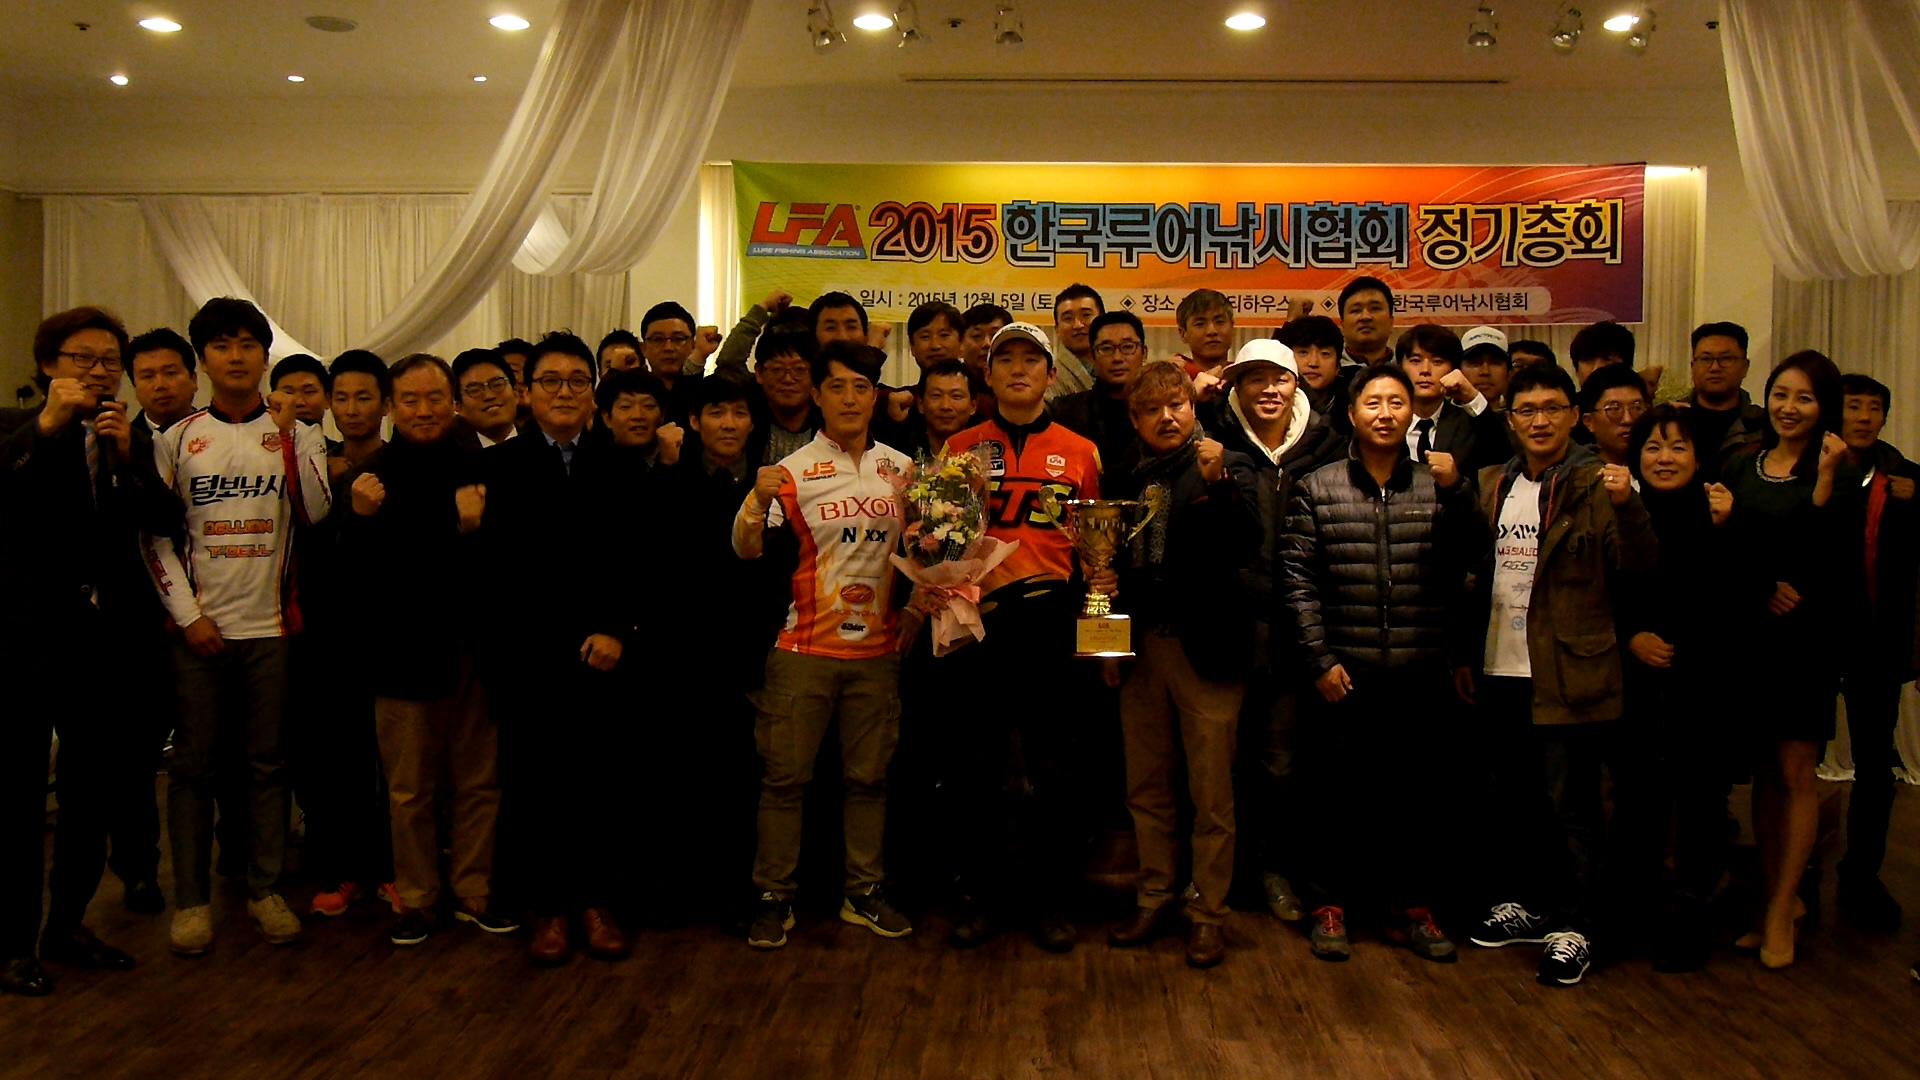 2015 LFA 제3회 정기총회 개최, 2016년 목표는 '공동 성장'